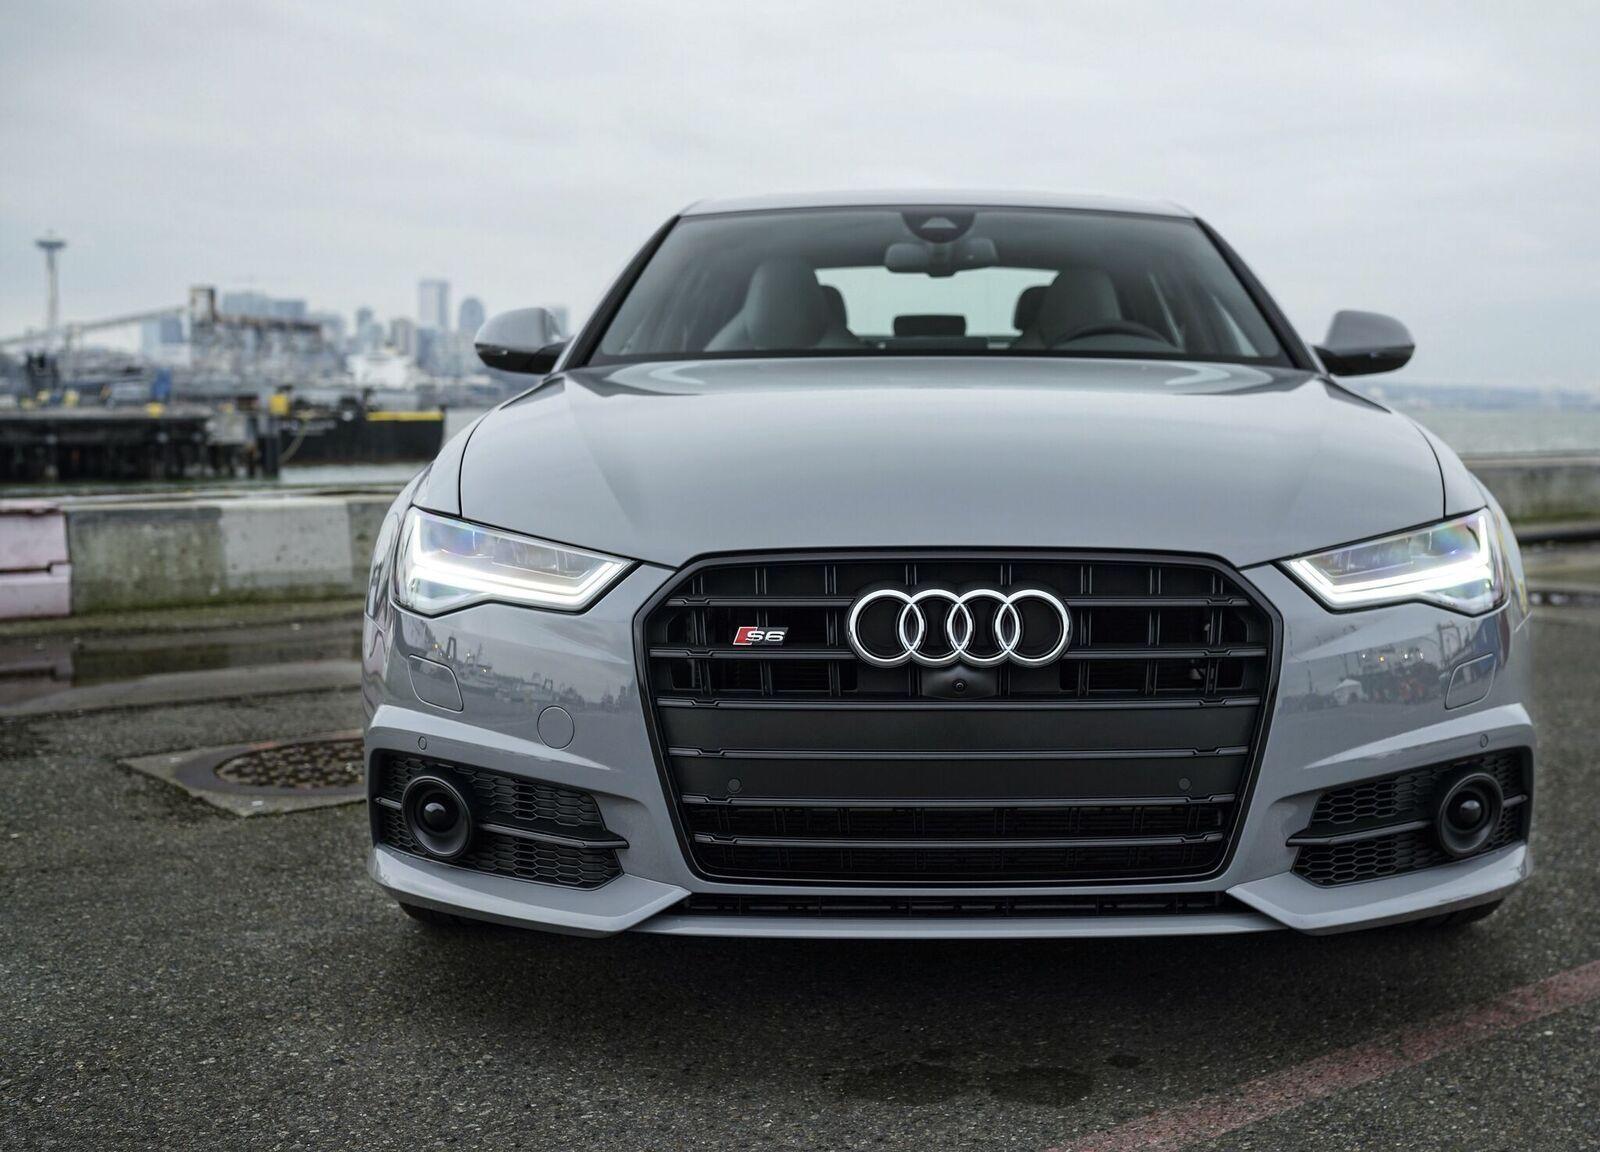 S6 Nardo Audi Seattle U District Seattle Wa Audiseattle Com Audi Dealership Audi S6 Audi